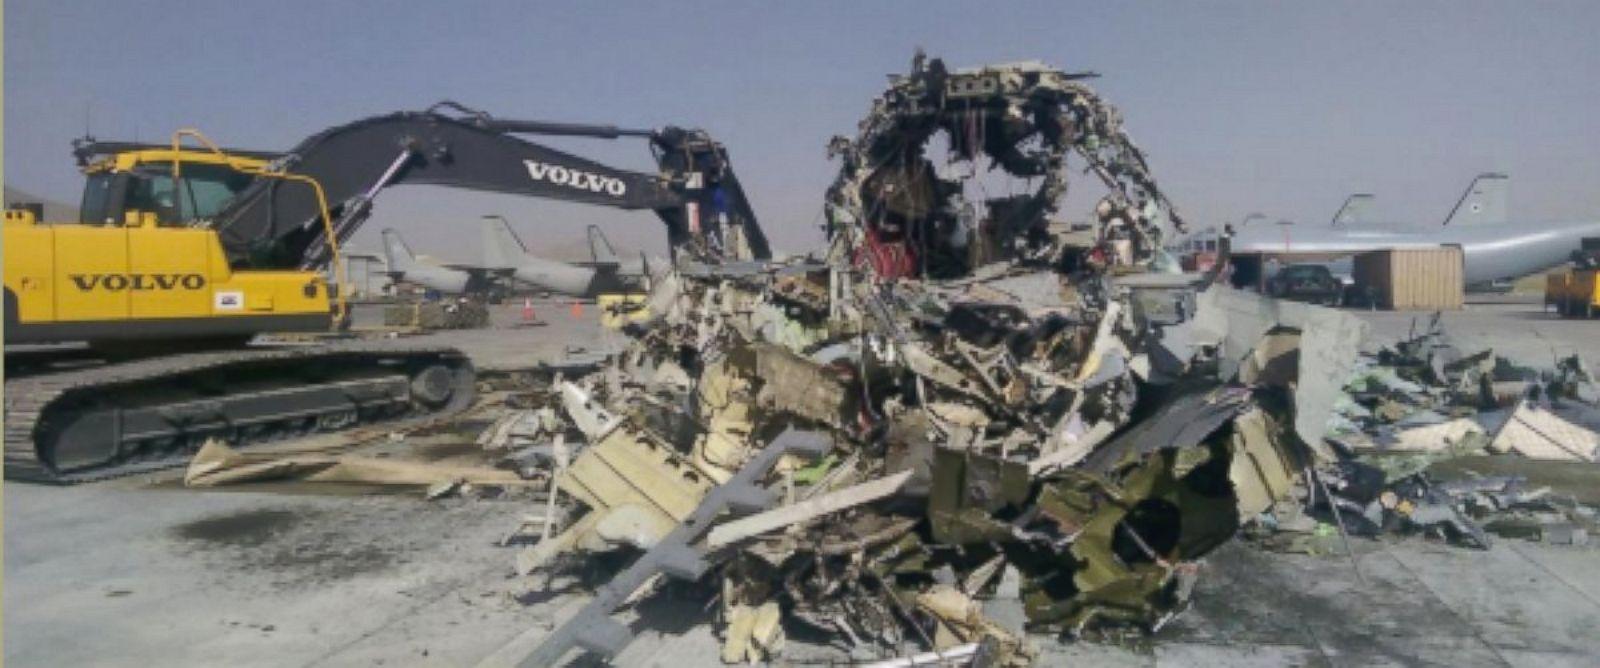 pd_g222_afghanistan_scrapped_kb_141009_12x5_1600.jpg